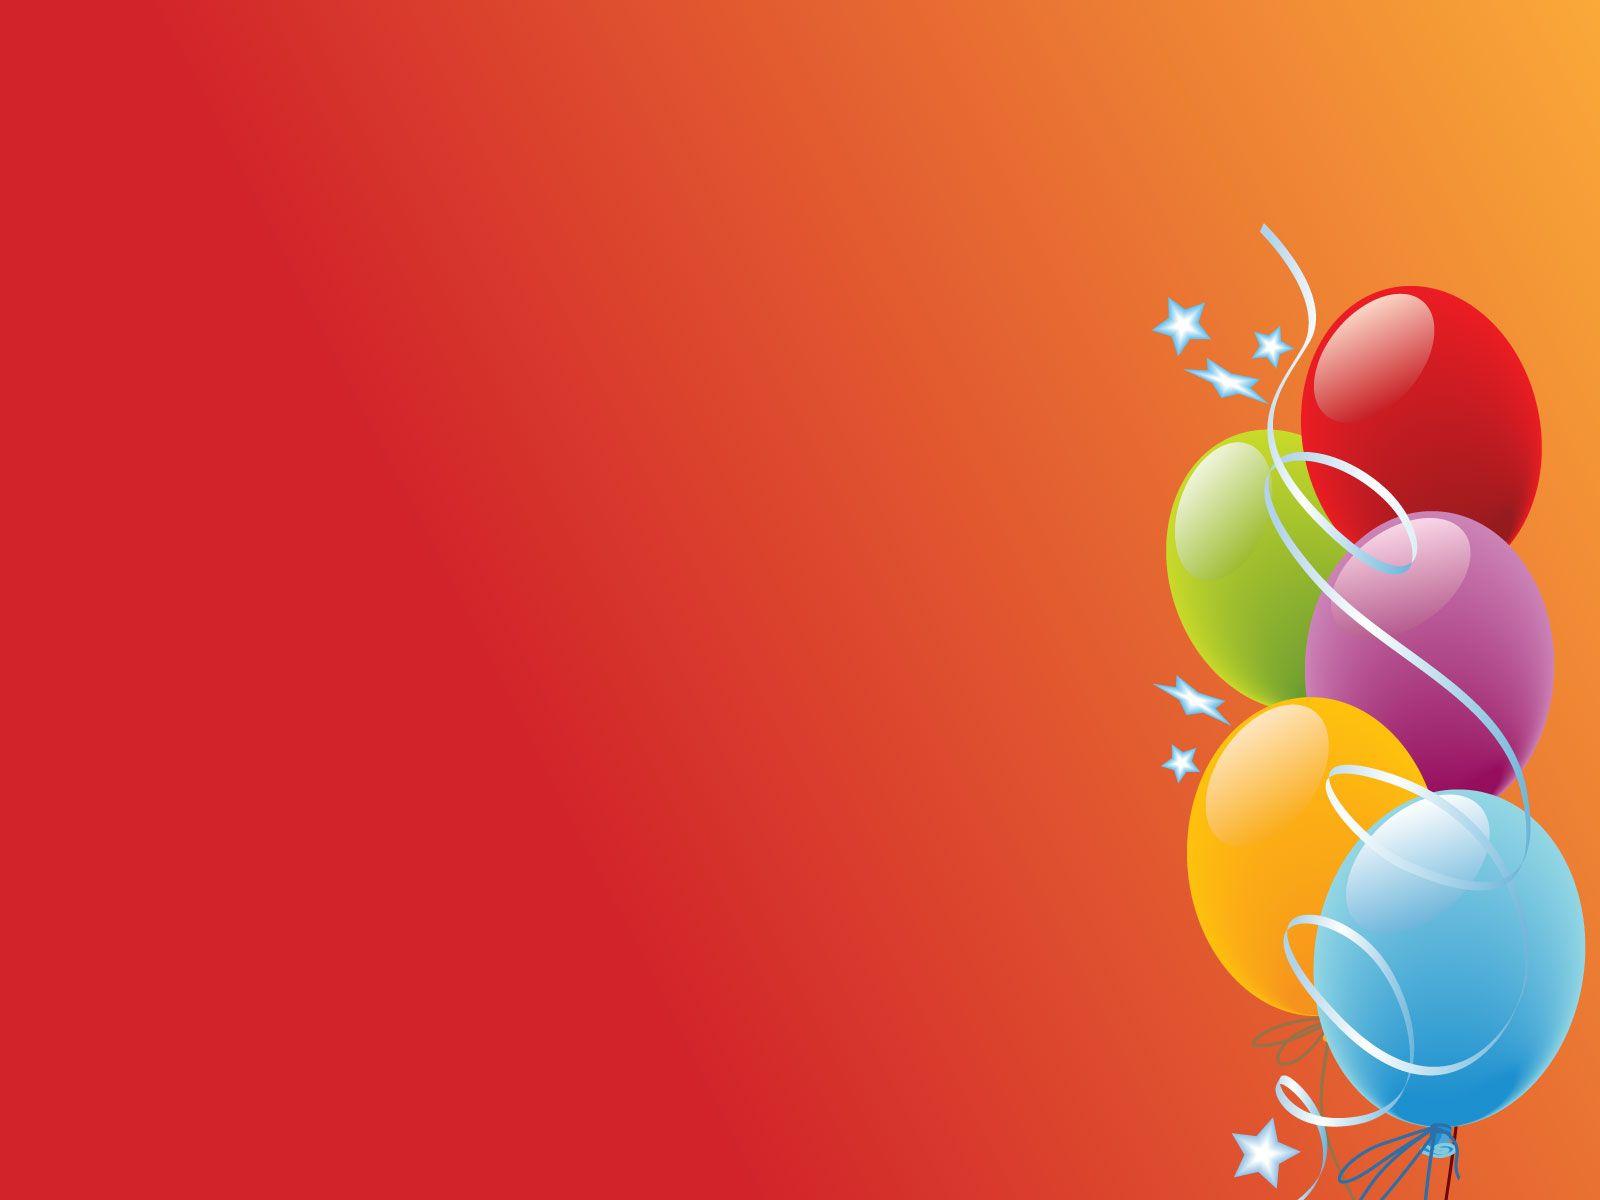 balloons celebration wallpaper - photo #13